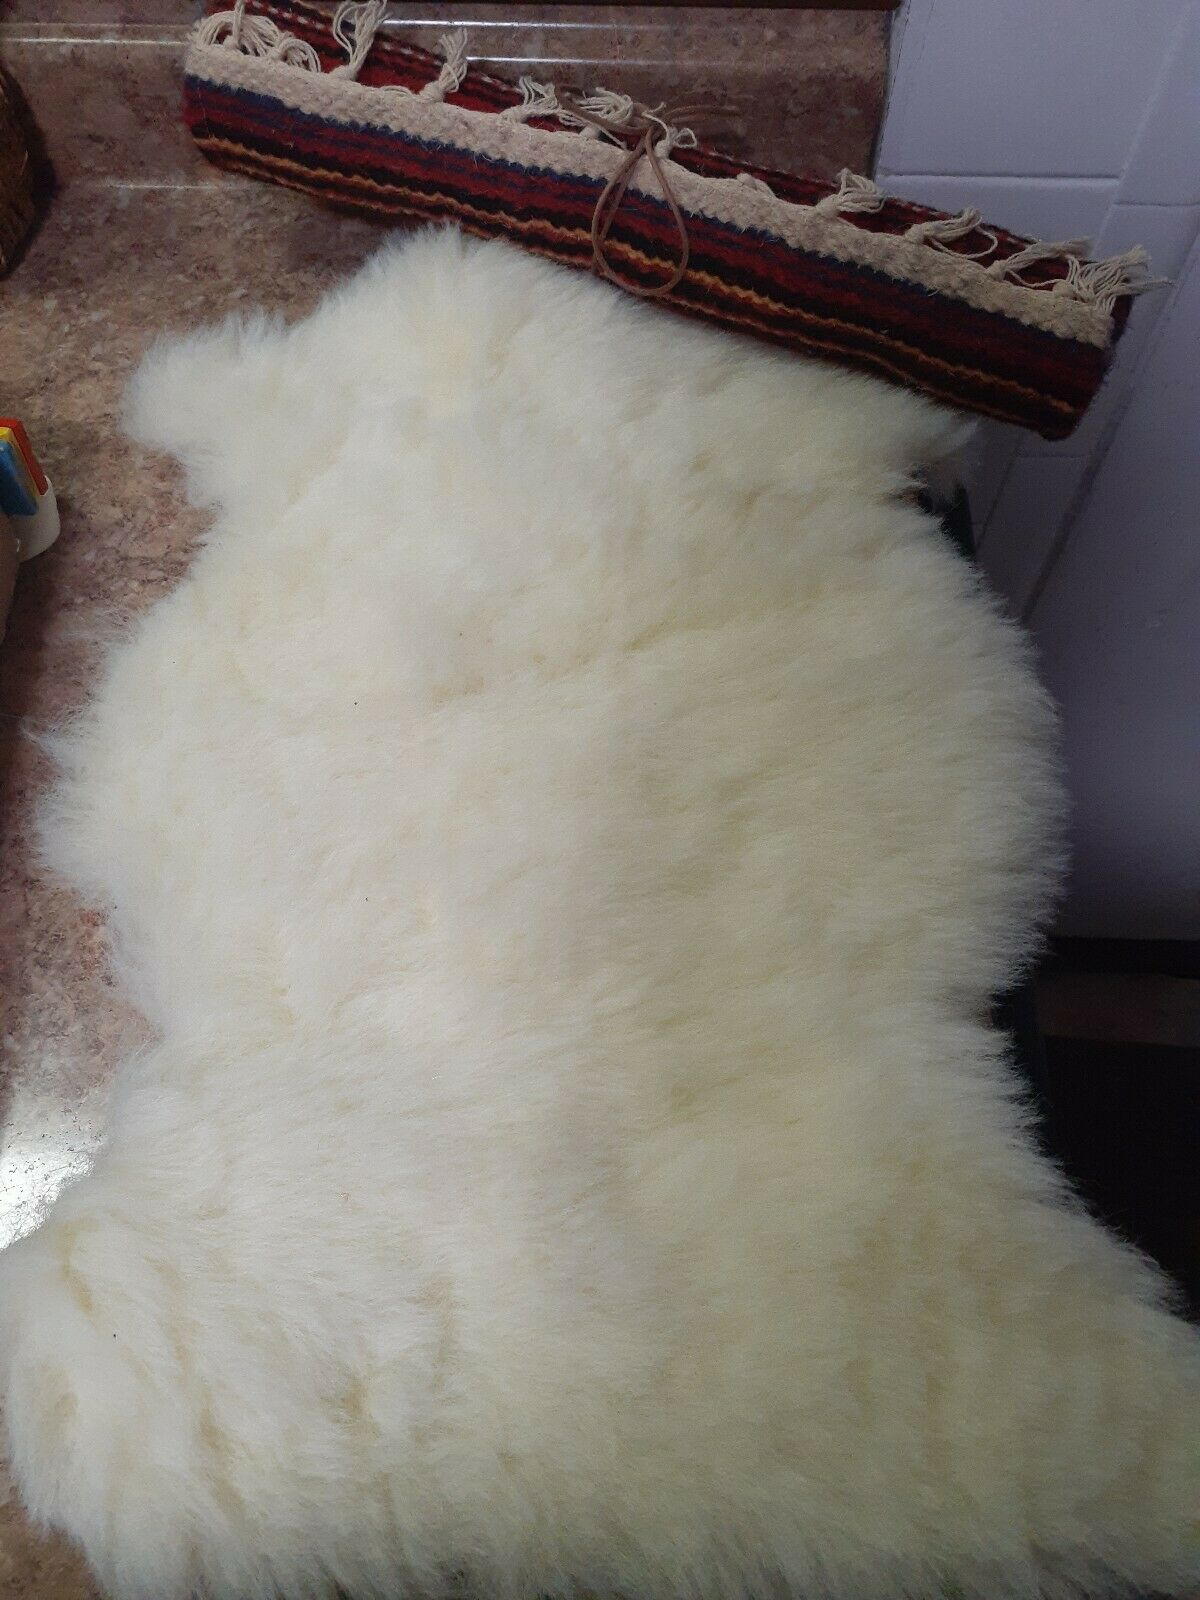 Josefina American Girl Pleasant Company Sheepskin Blanket - Hard to Find